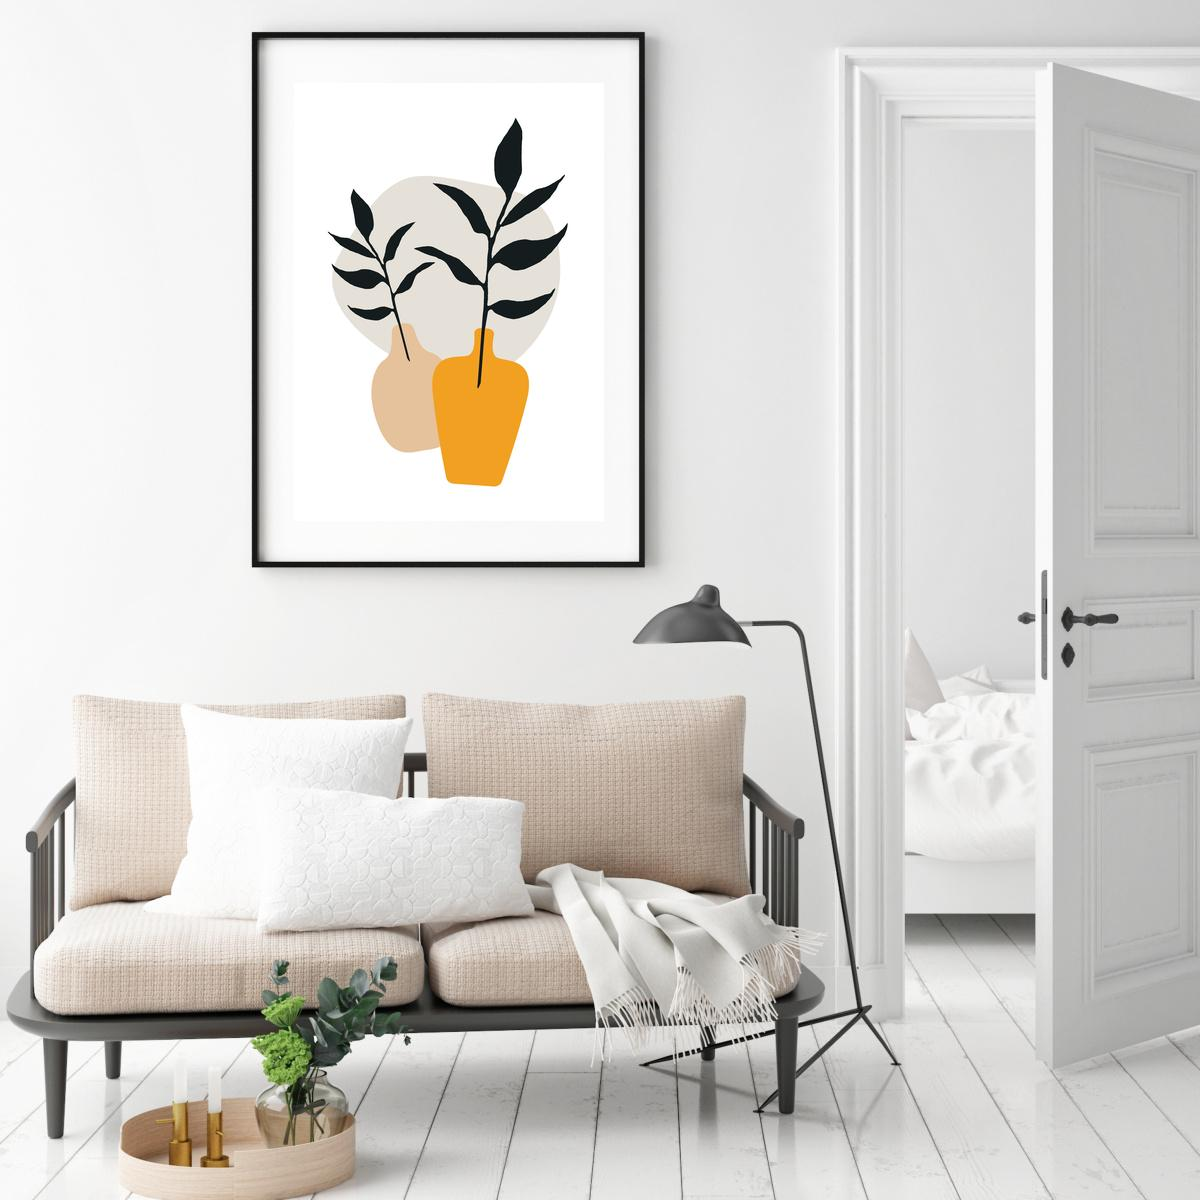 Plakat - Vase 2 (S040097SA4)